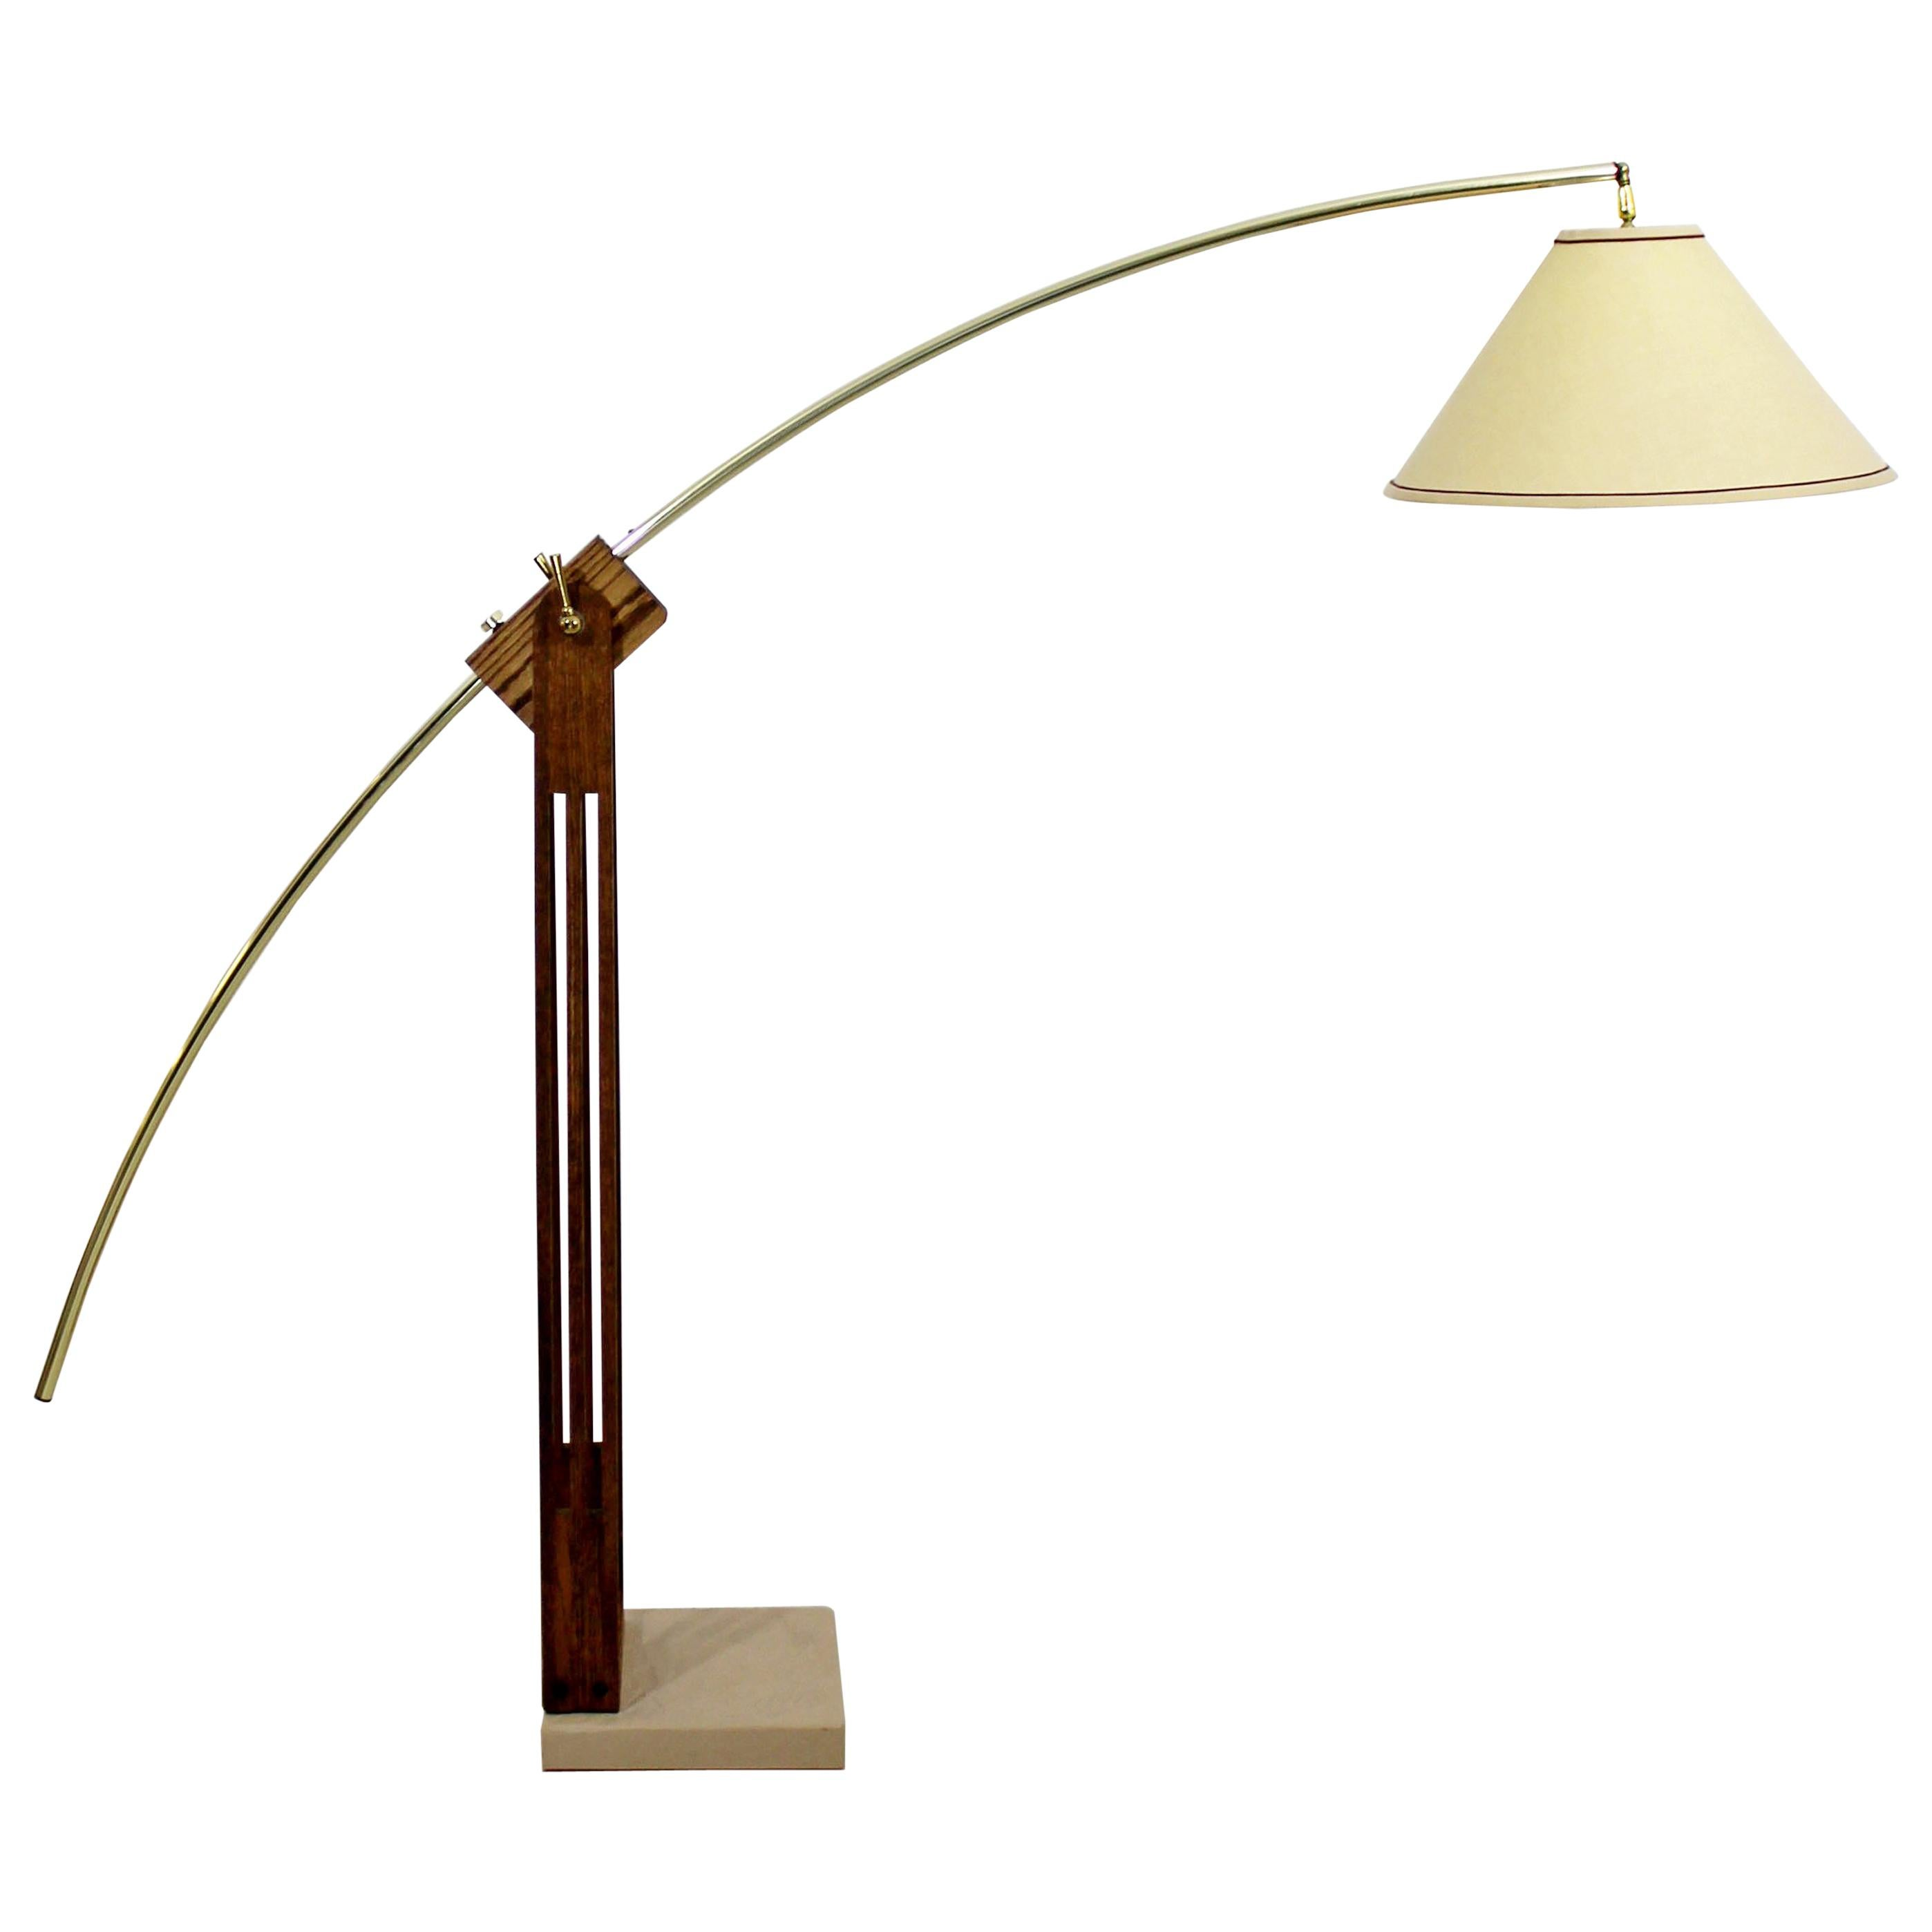 f86530b6e9de0 Mid-Century Modern Laurel Brass and Wood Floor Lamp with Original Shade